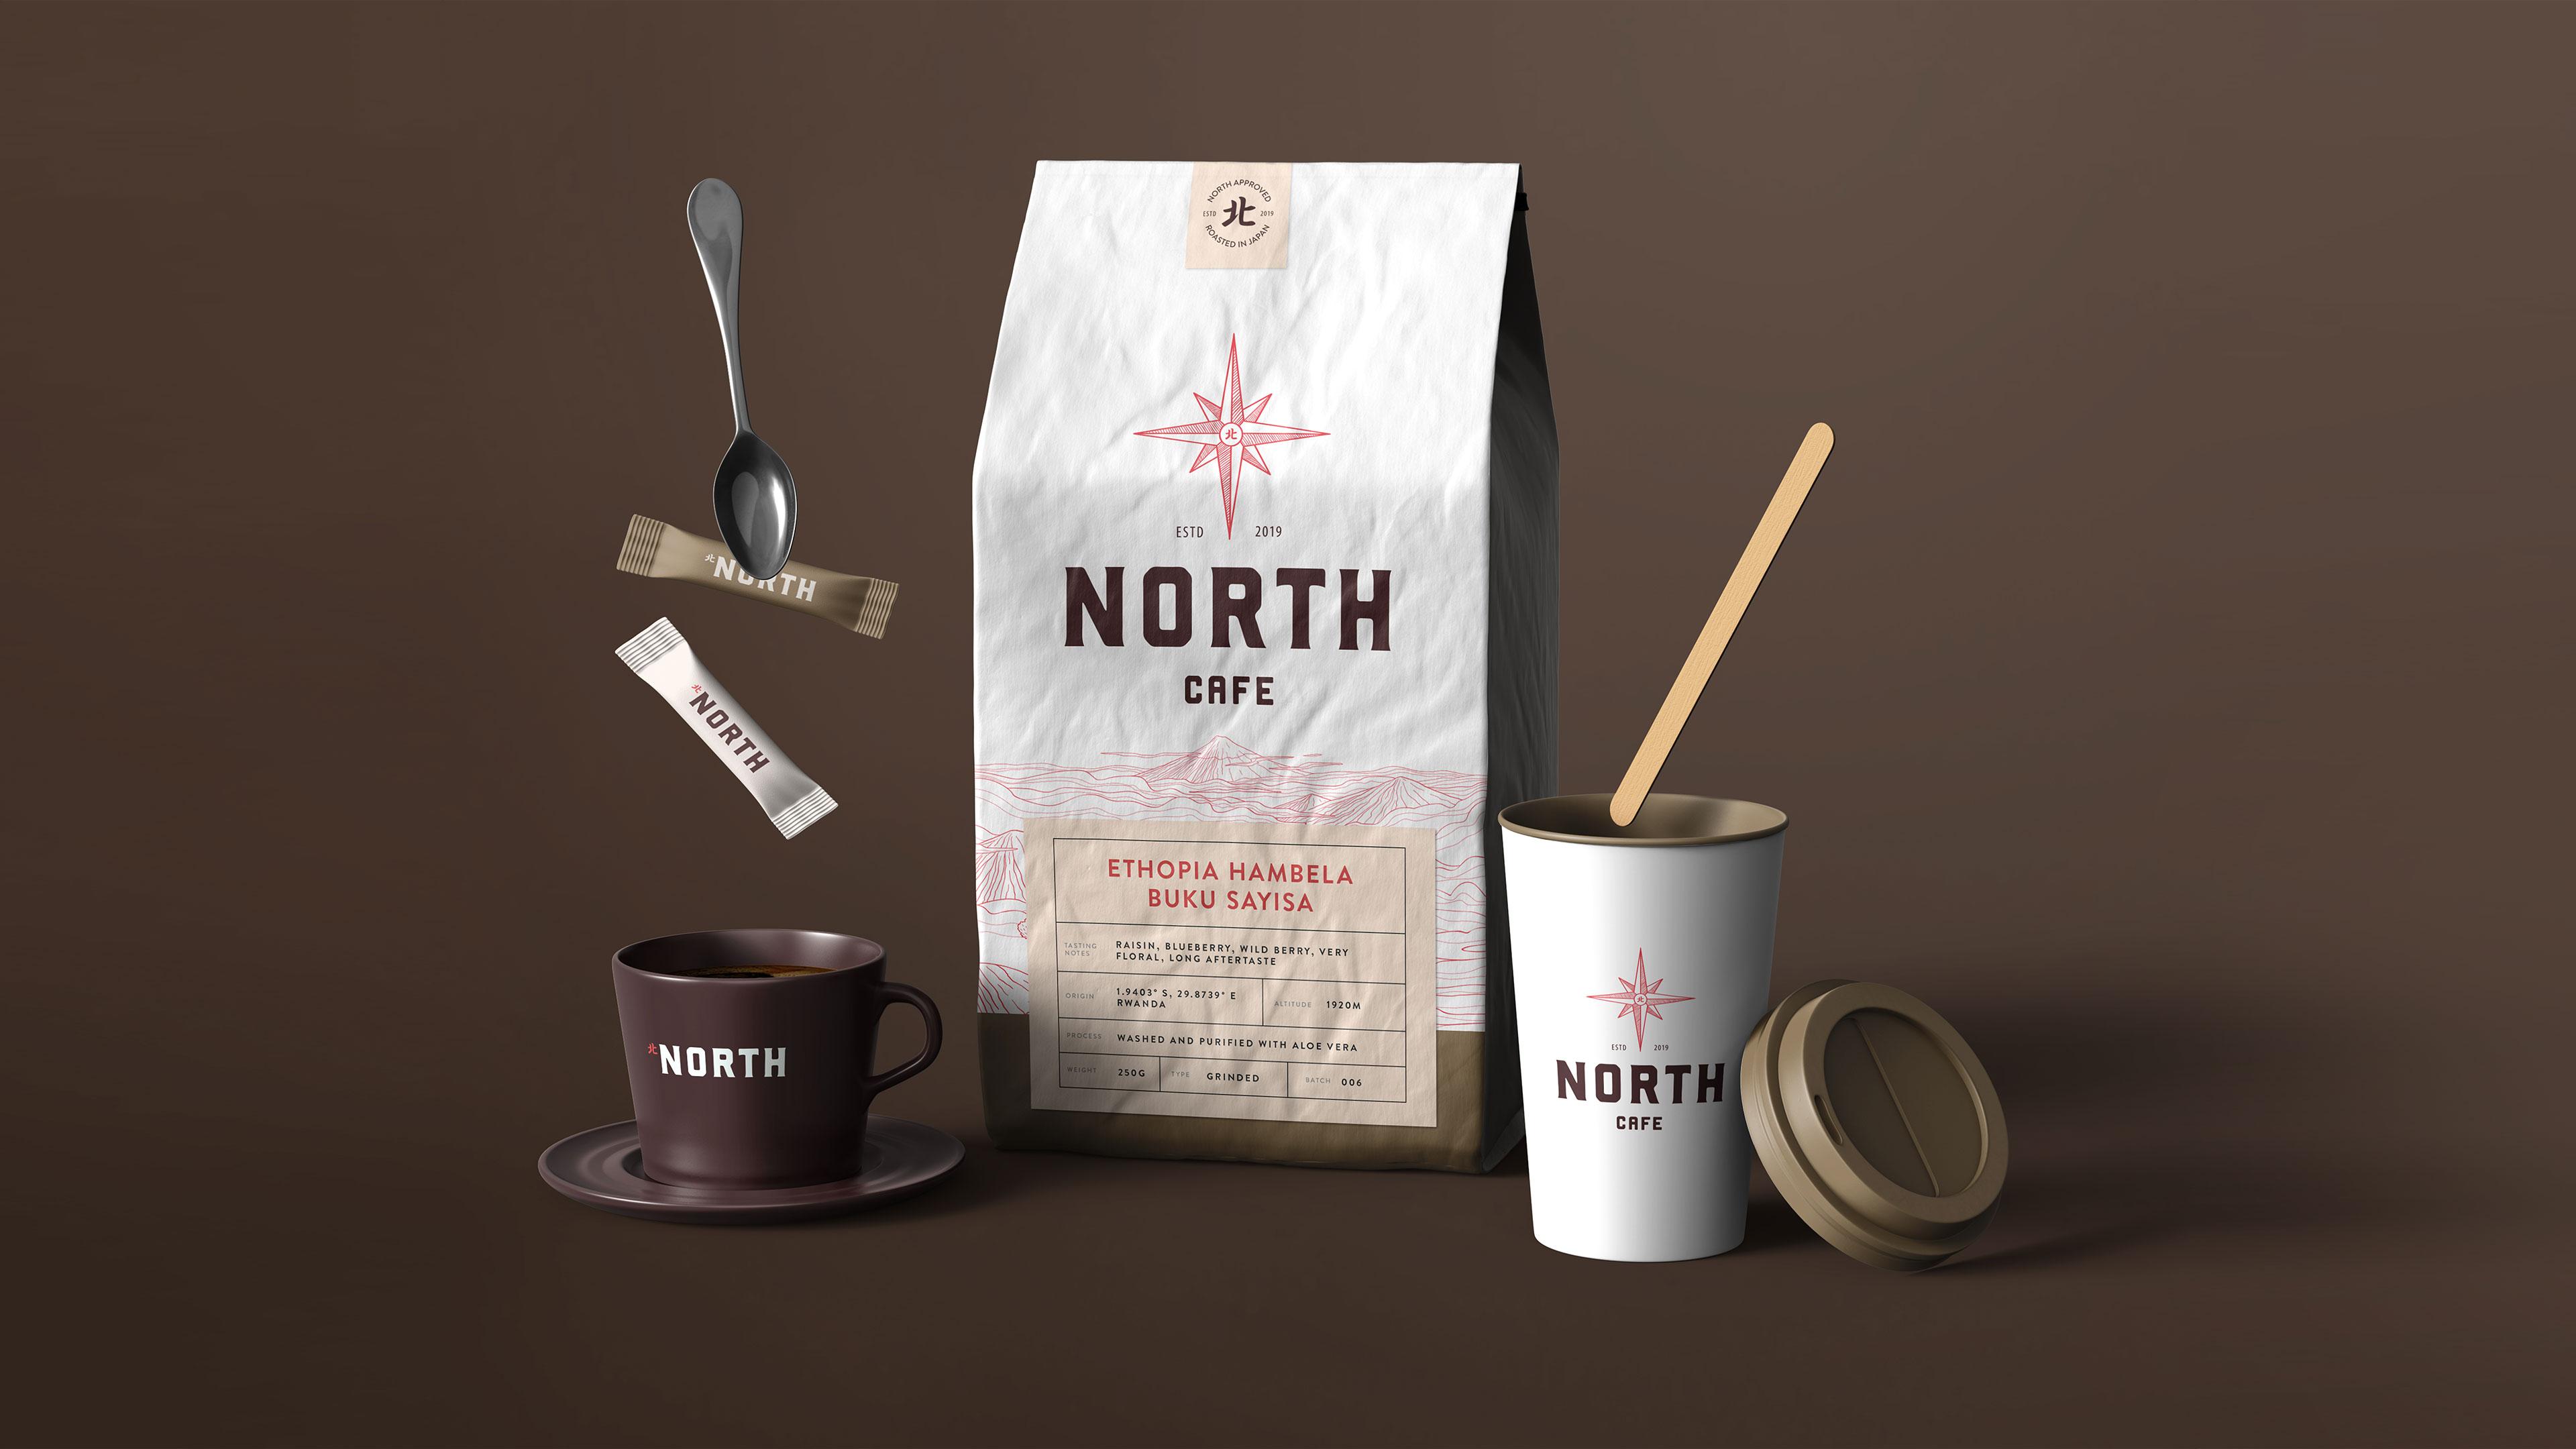 North Cafe